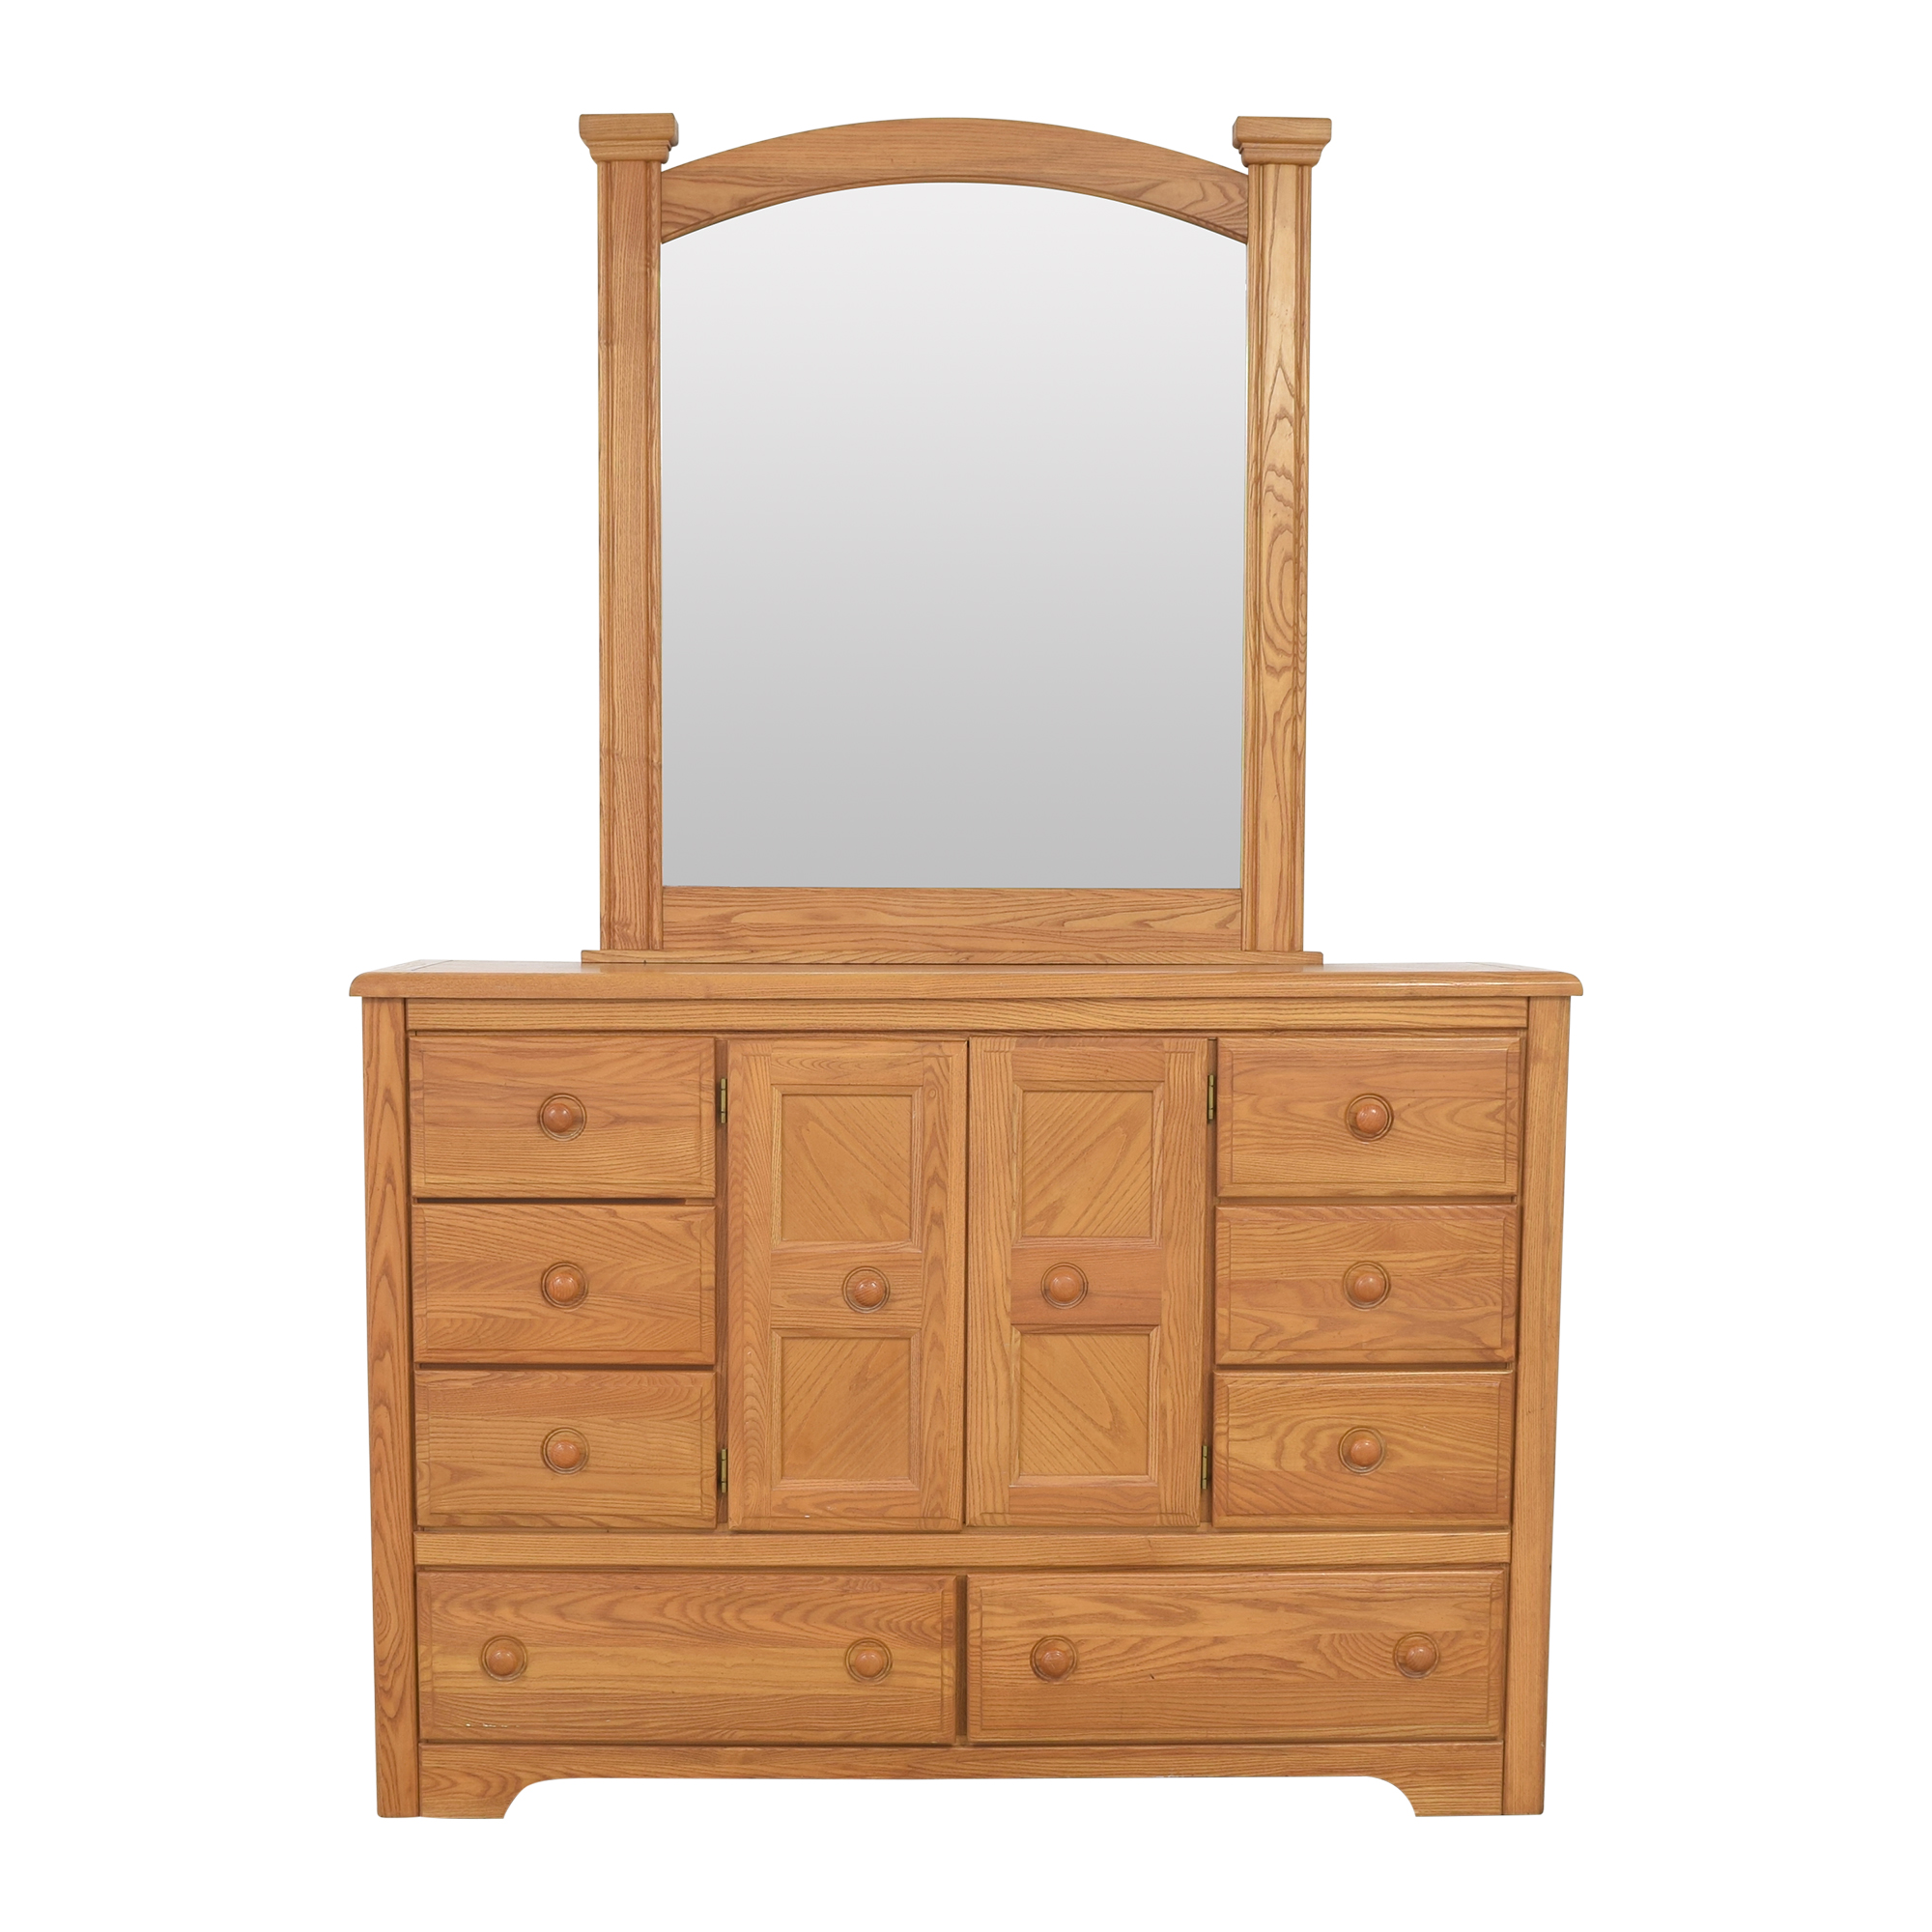 Vaughan-Bassett Vaughan-Bassett Eleven Drawer Dresser with Mirror dimensions